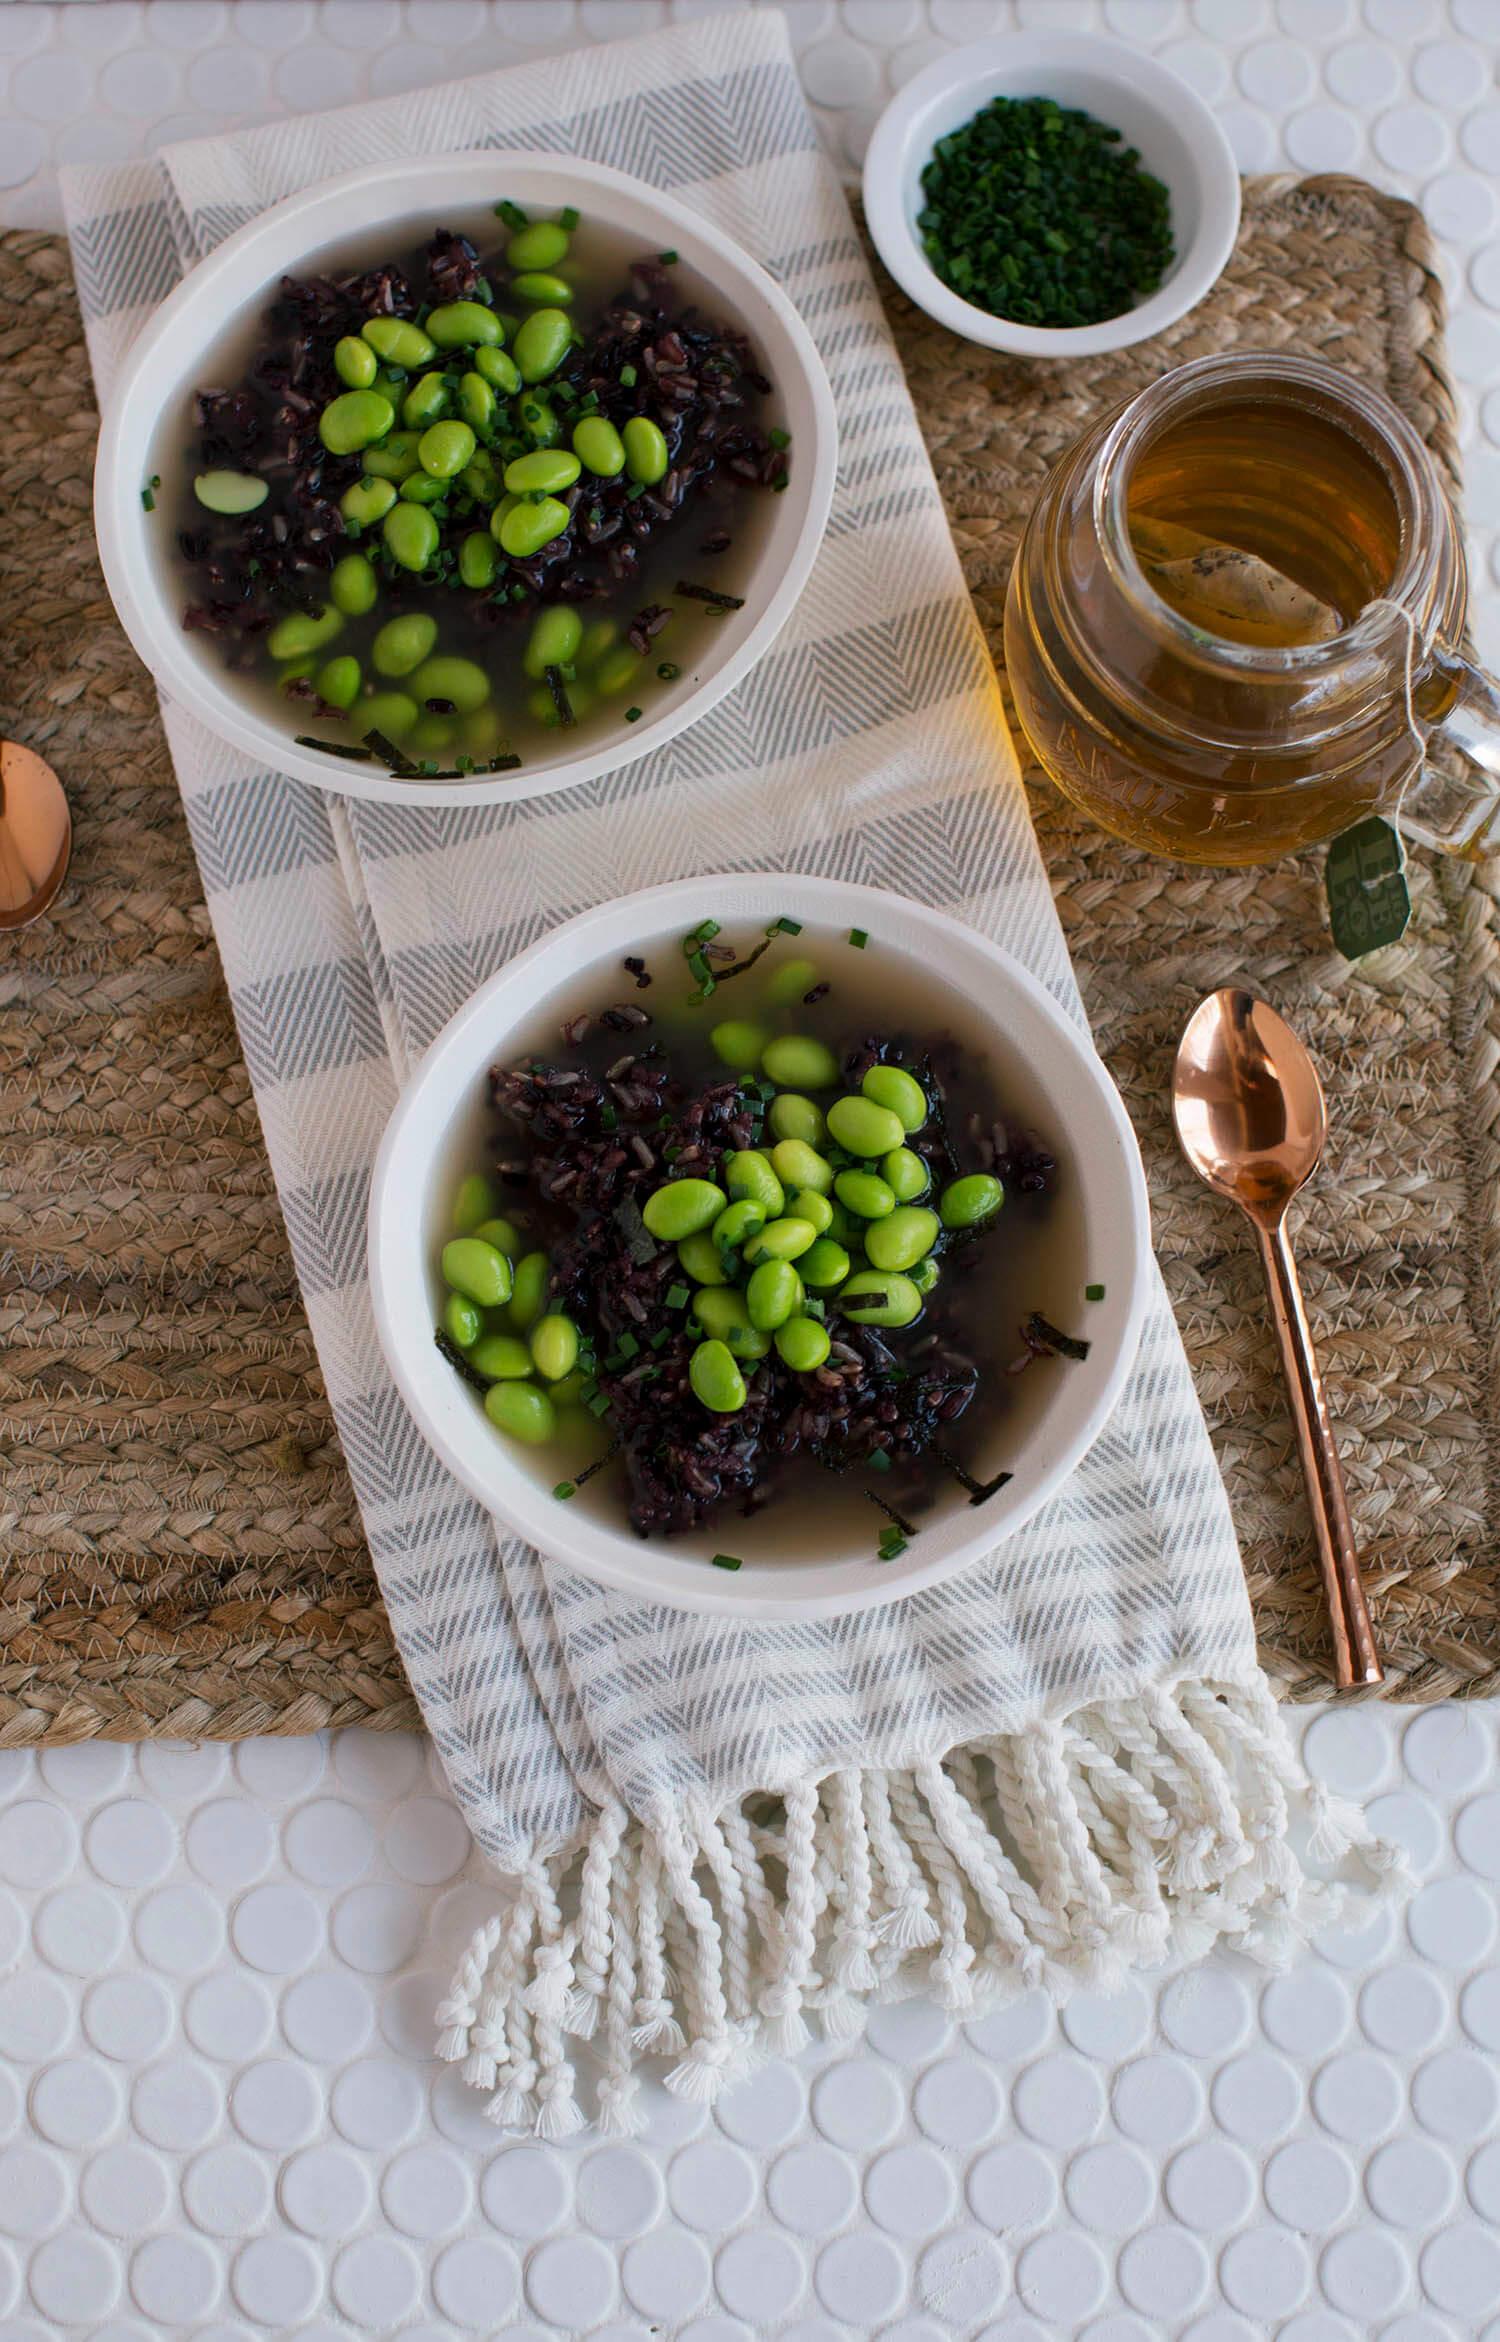 Miso Soup with Wild Rice and Edamame (via sleekbawd.com)